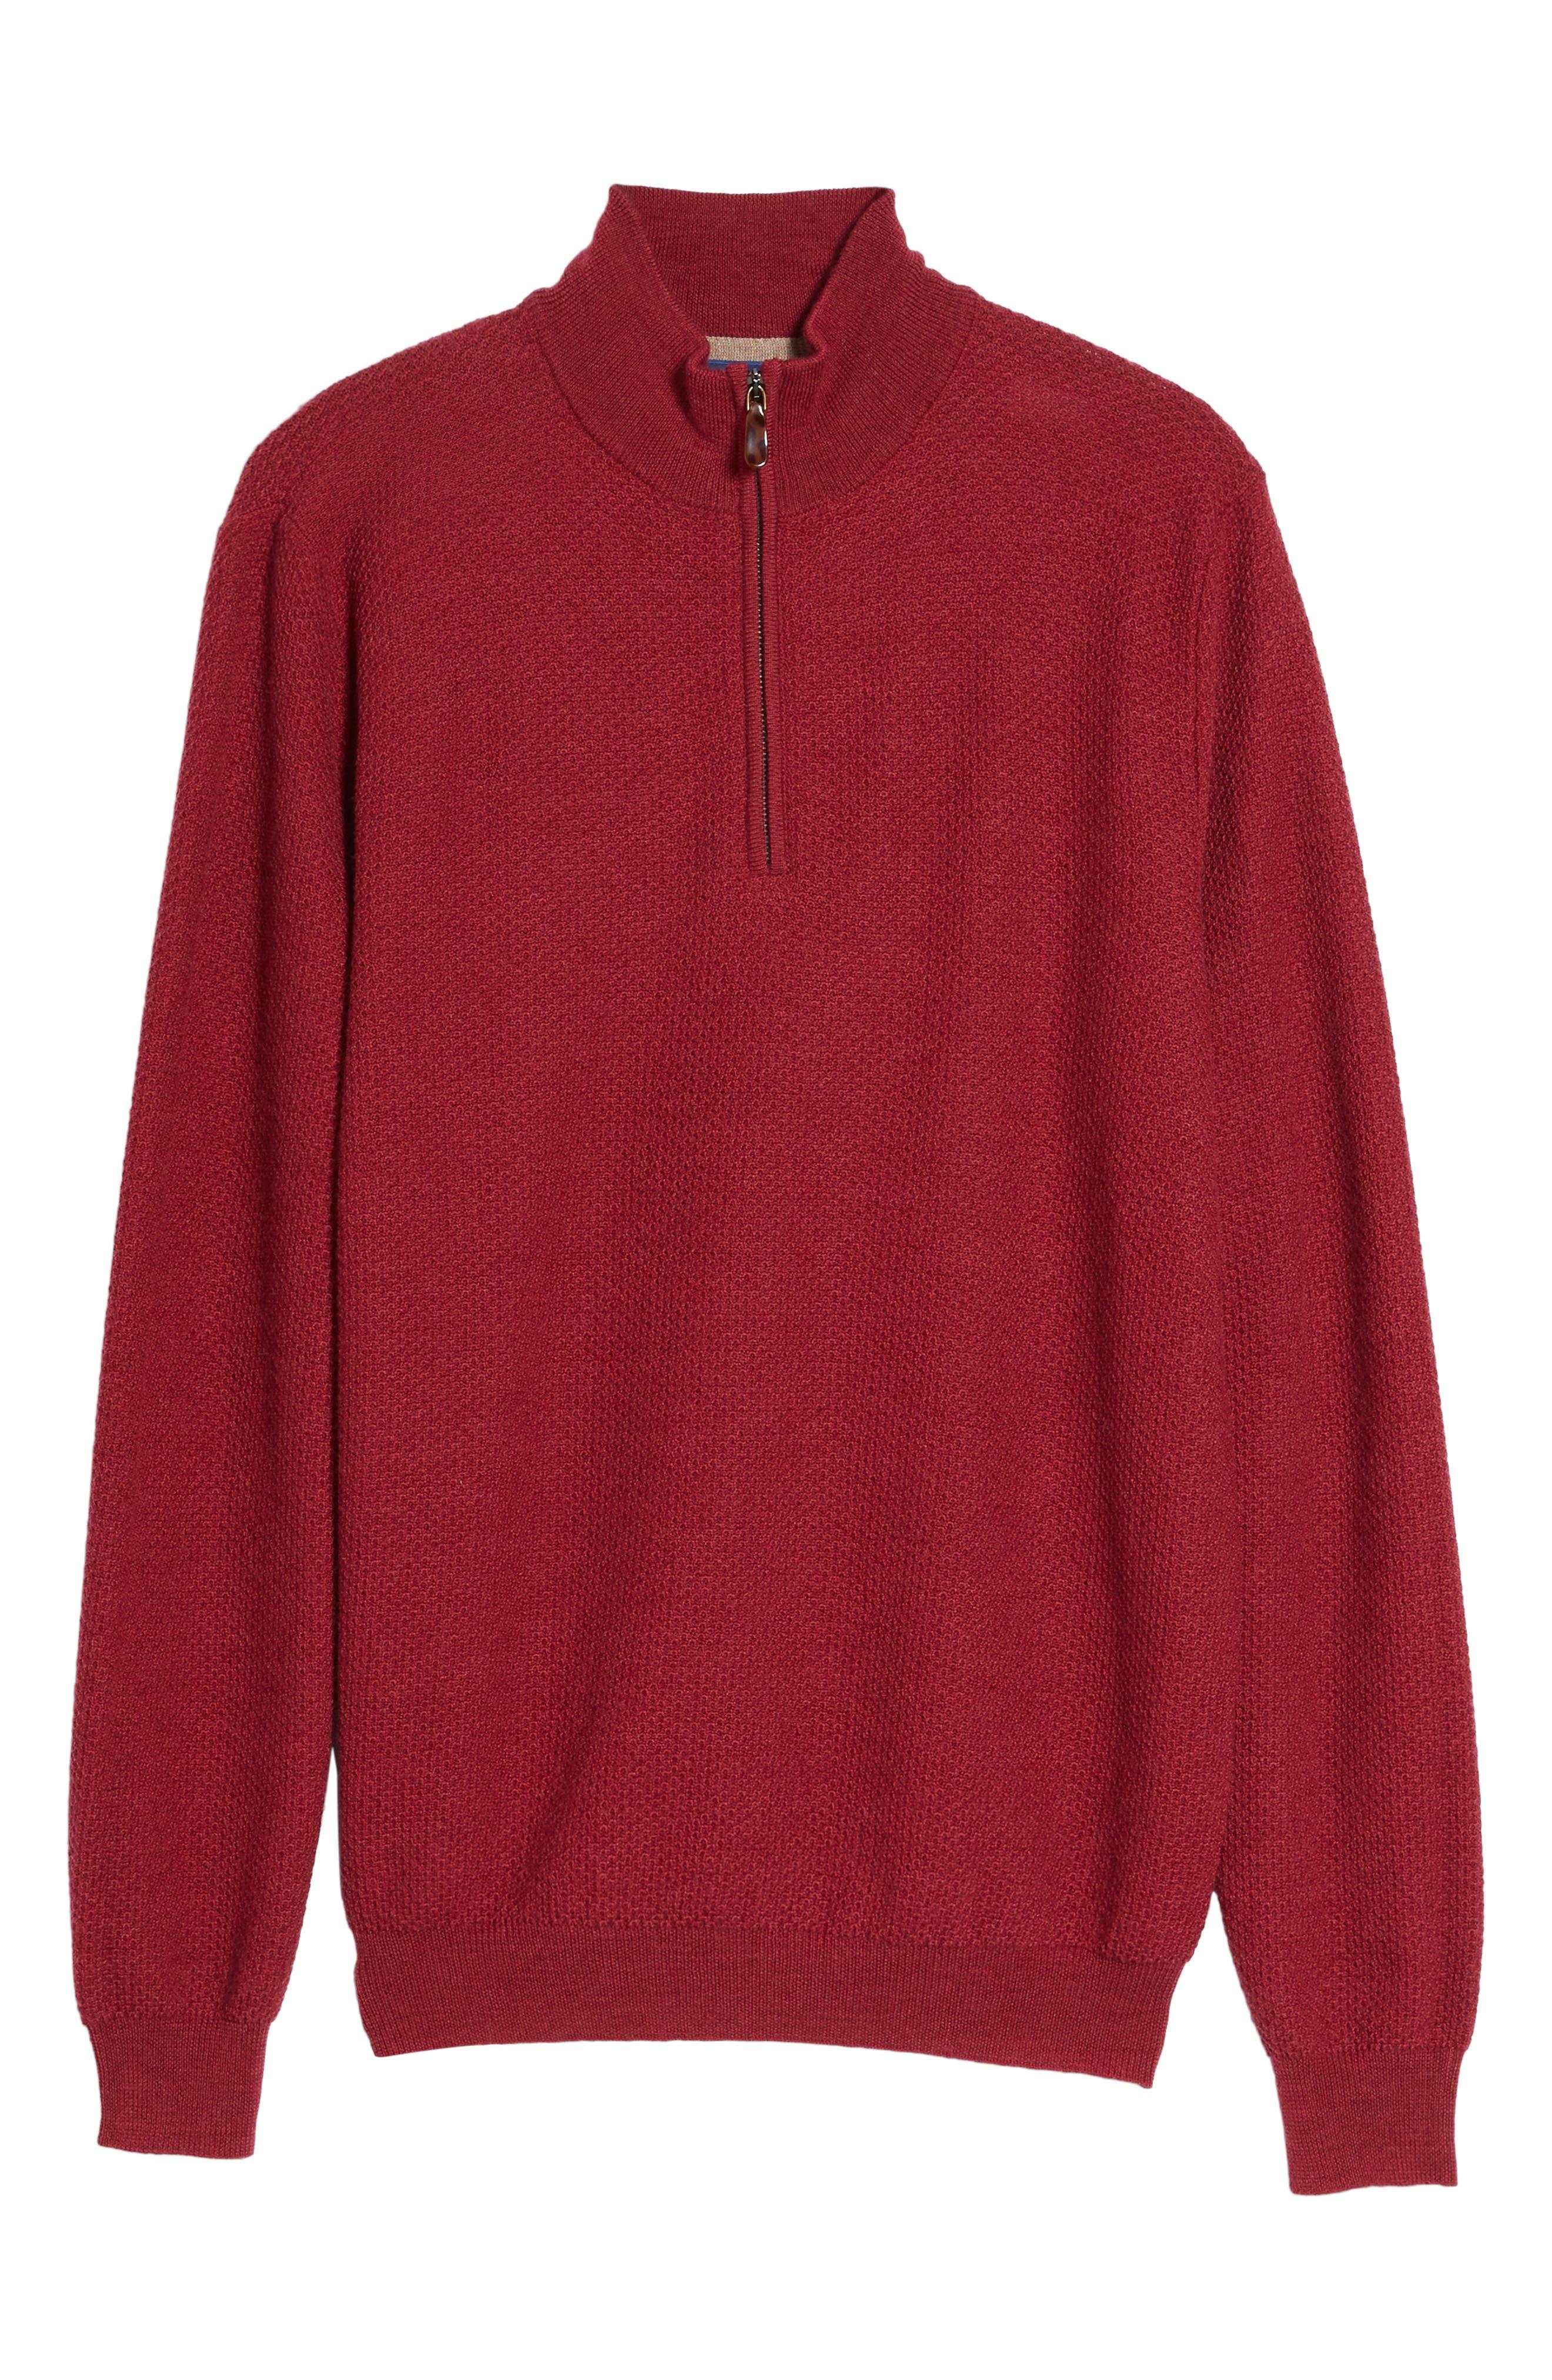 Honeycomb Merino Wool Quarter Zip Pullover,                             Alternate thumbnail 18, color,